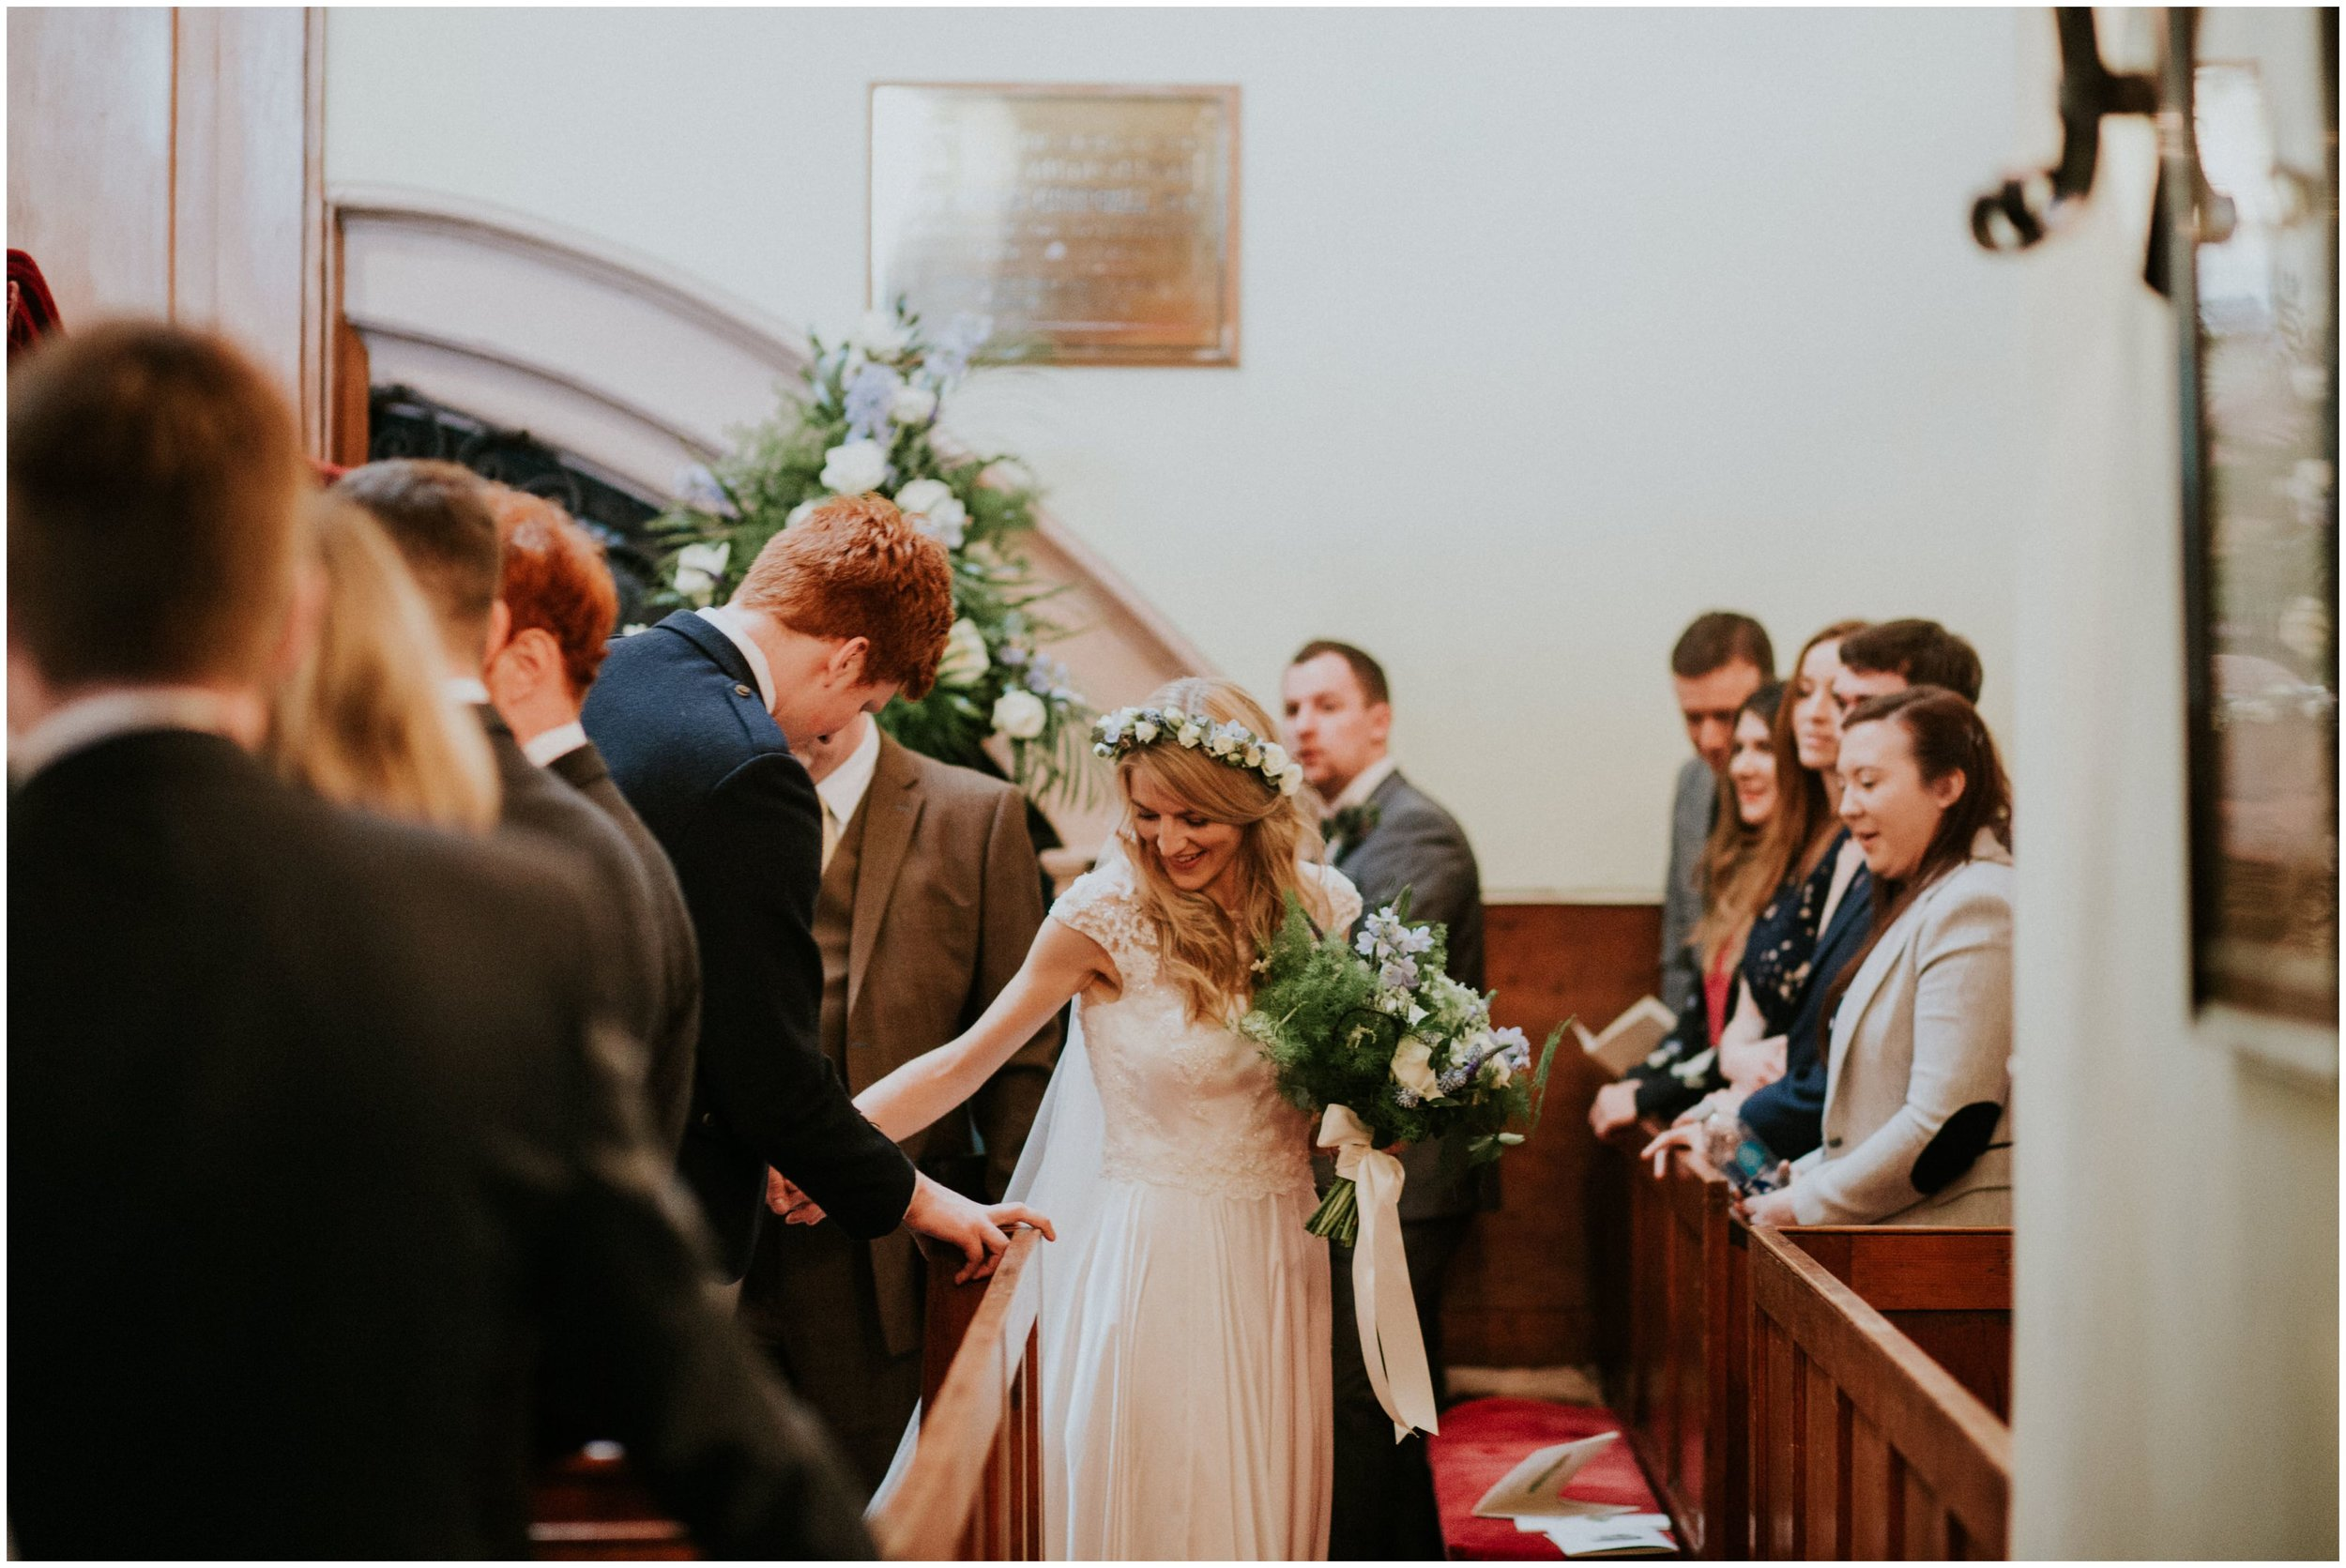 Photography 78 - Glasgow Wedding Photographer - Dave & Alana_0041.jpg